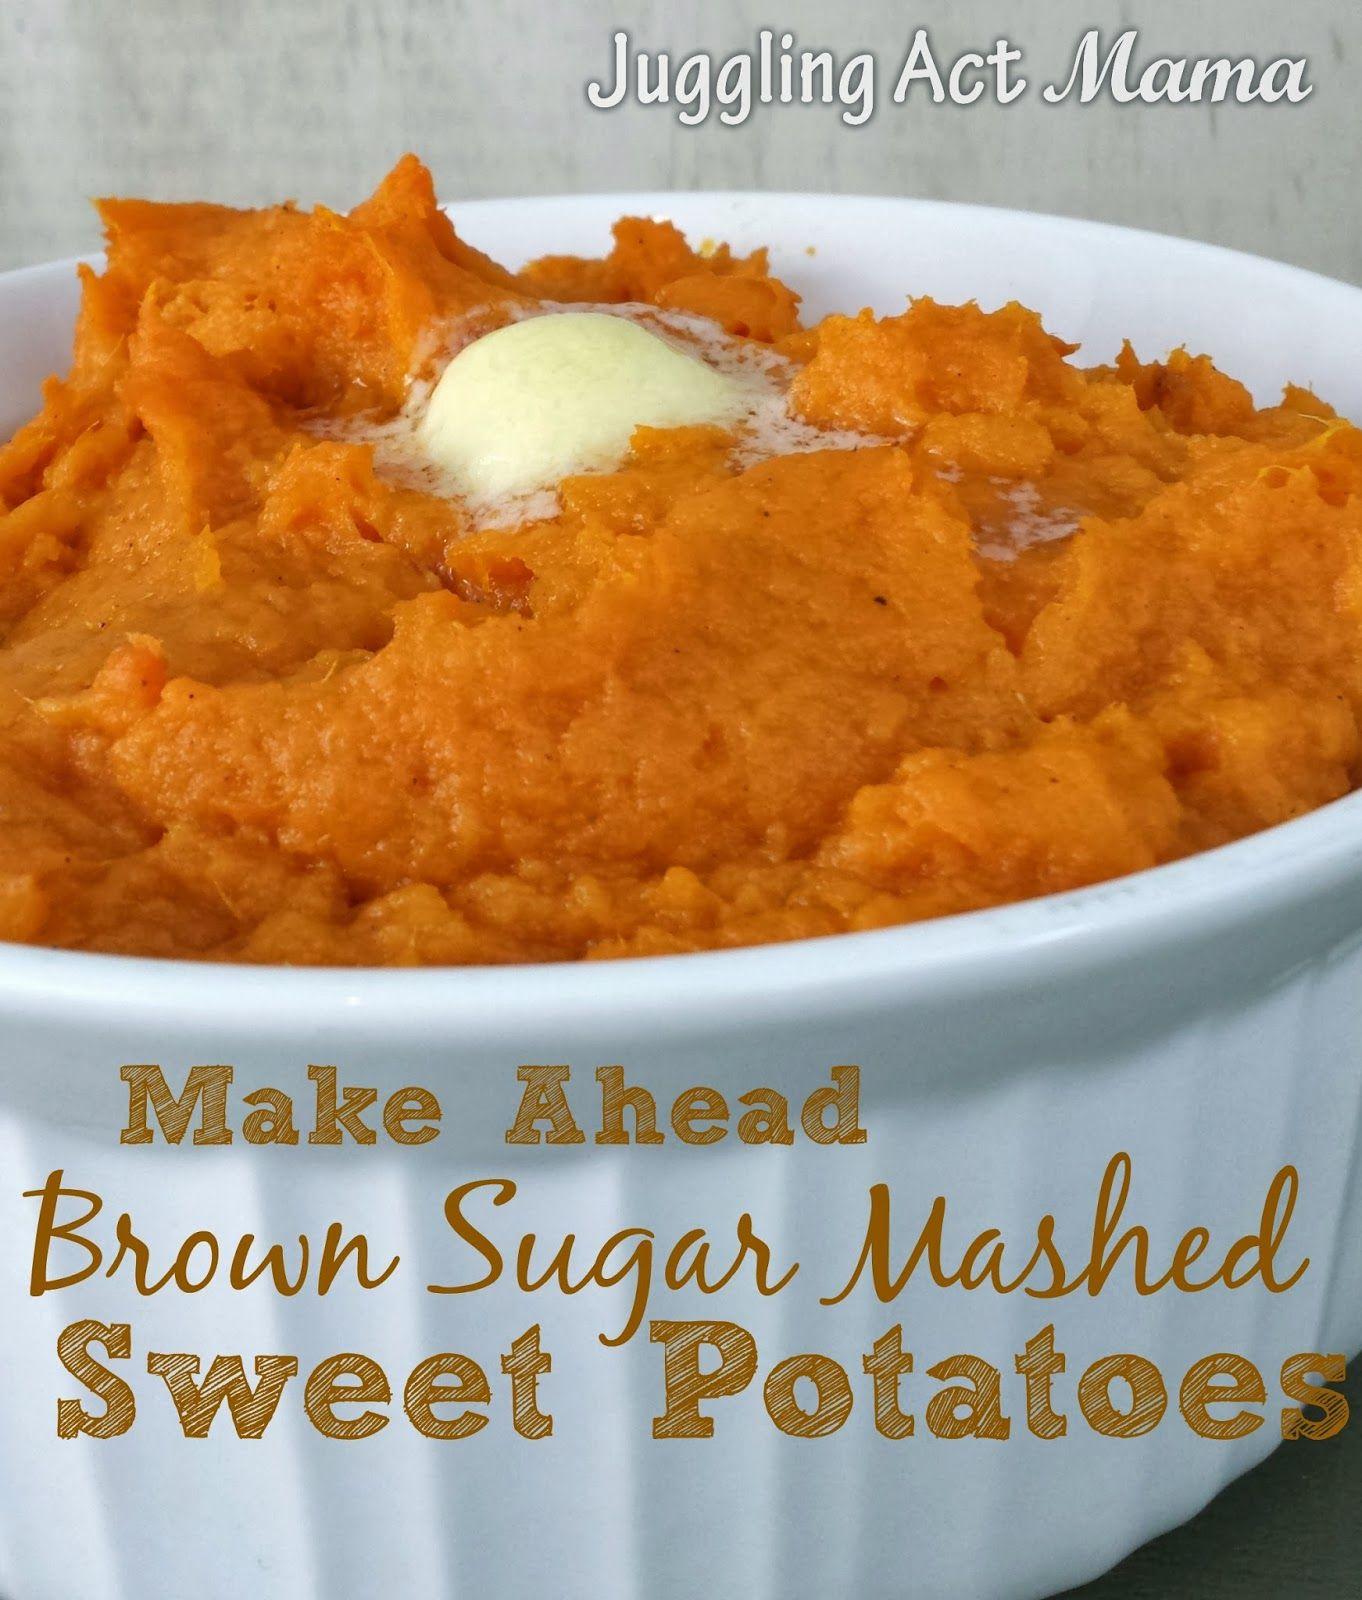 Make Ahead Mashed Sweet Potatoes Recipe Easy Mashed Sweet Potatoes Mashed Sweet Potatoes Sweet Potato Recipes Mashed